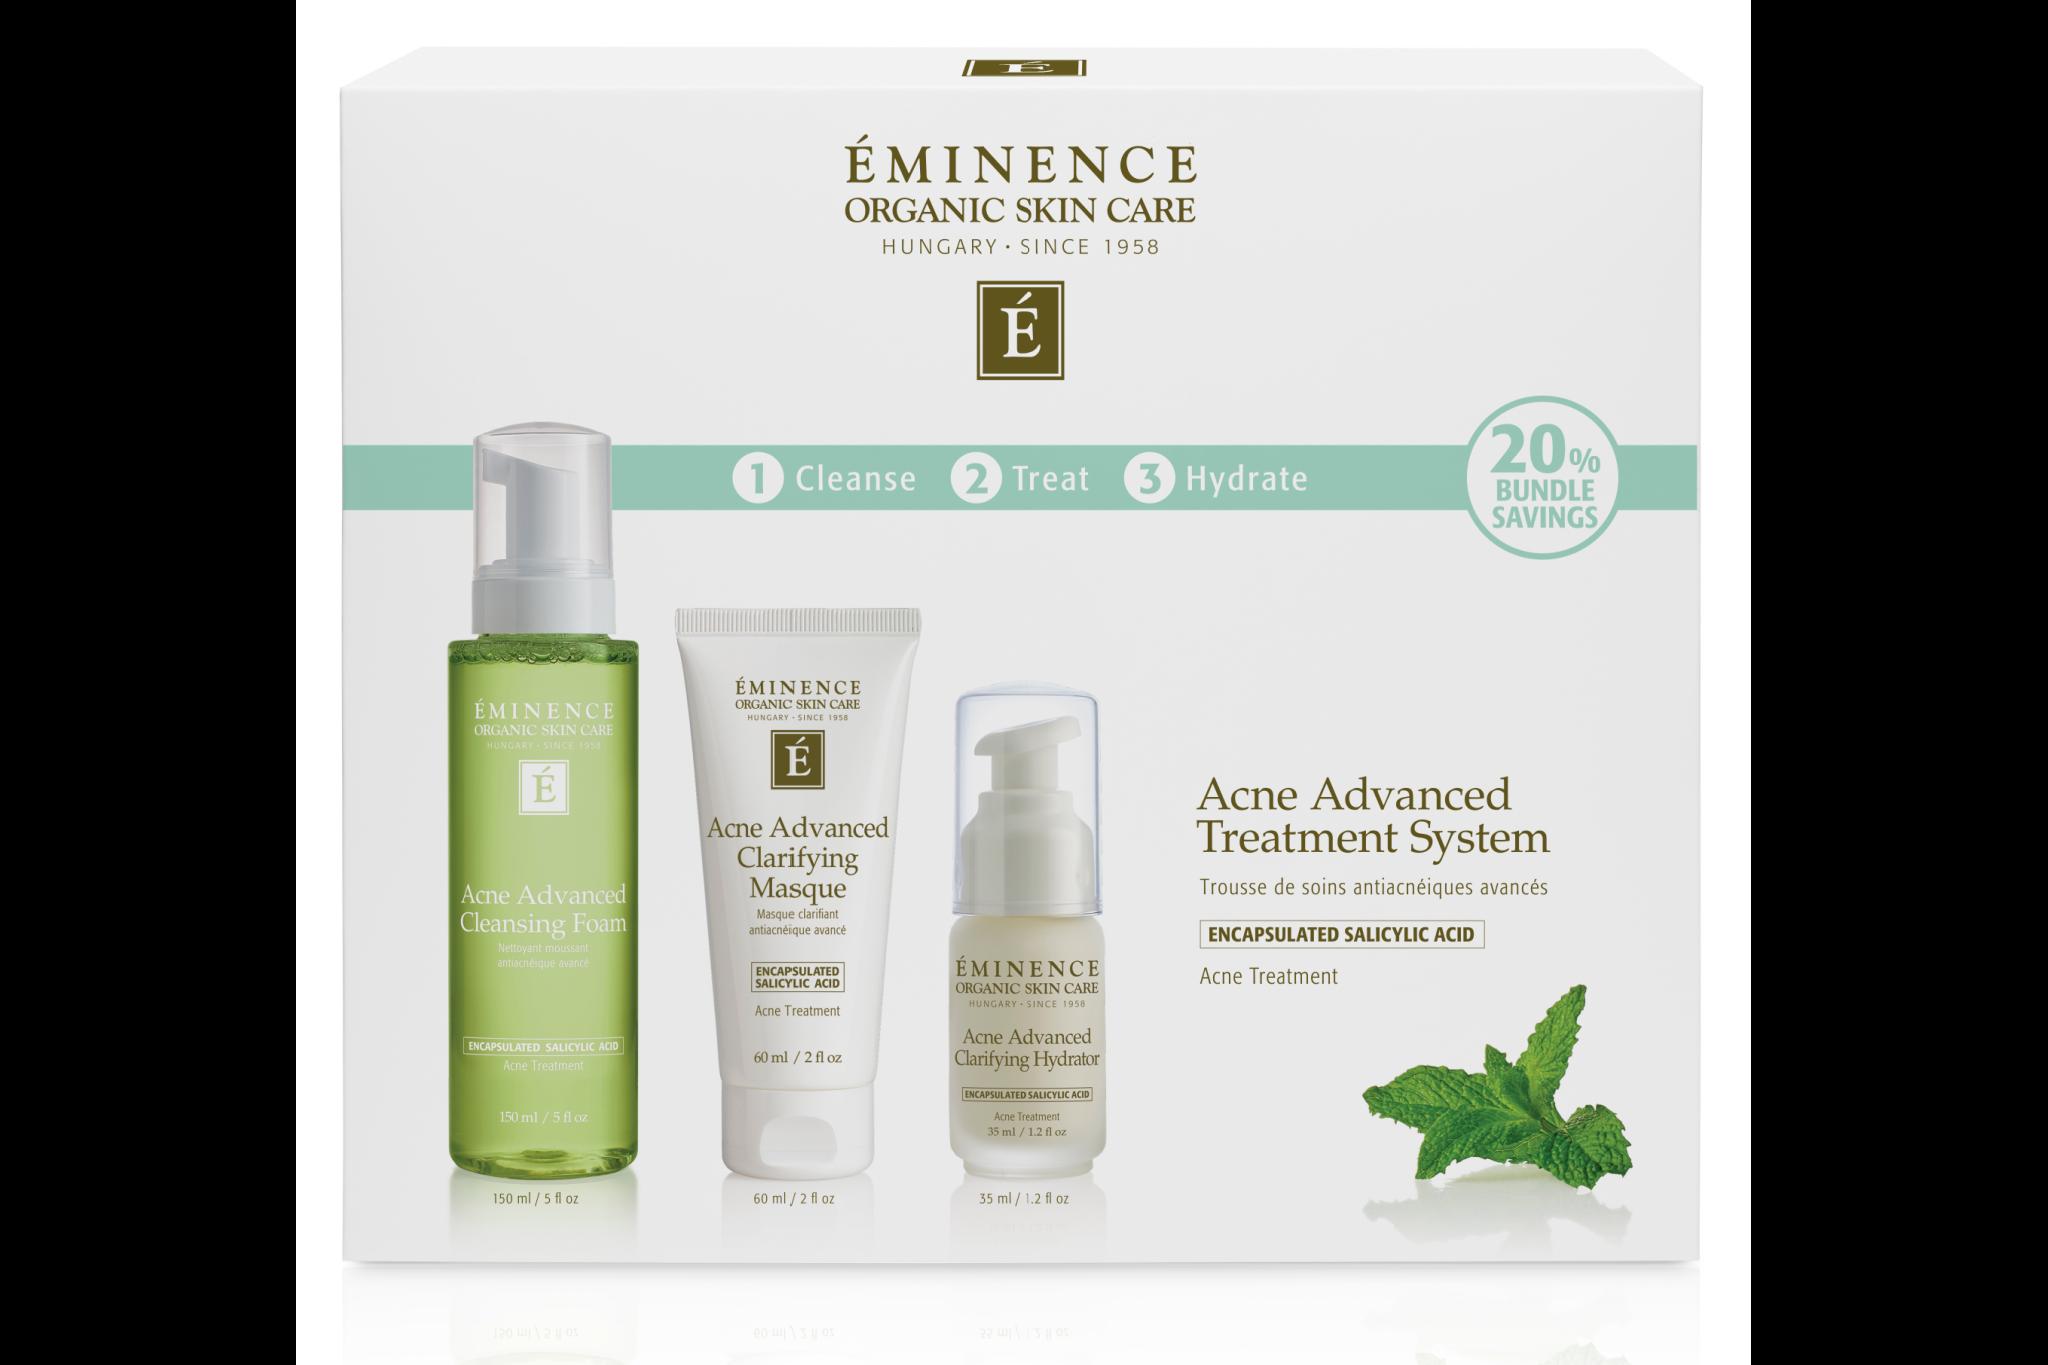 eminence-organics-acne-advanced-treatment-system-box-front-usd_0